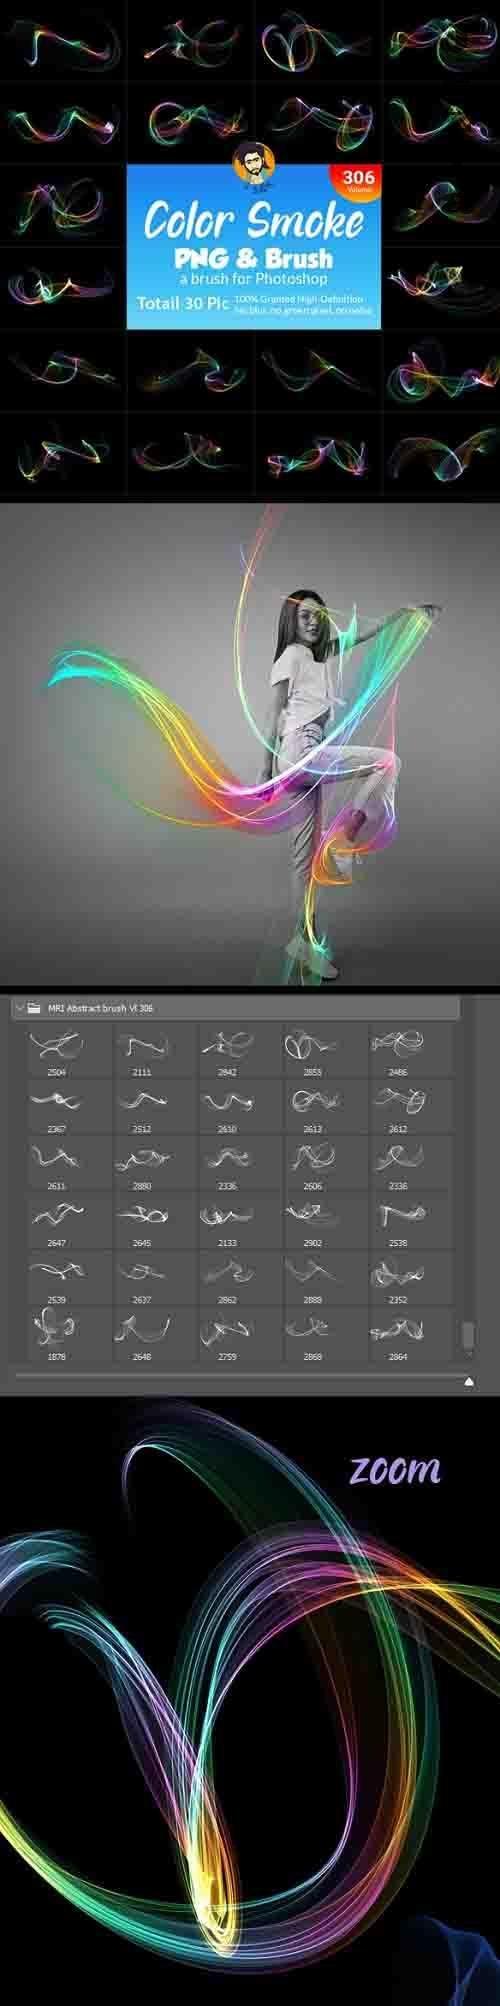 GraphicRiver - Abstract Smoke Brush and PNG Shape 29956103